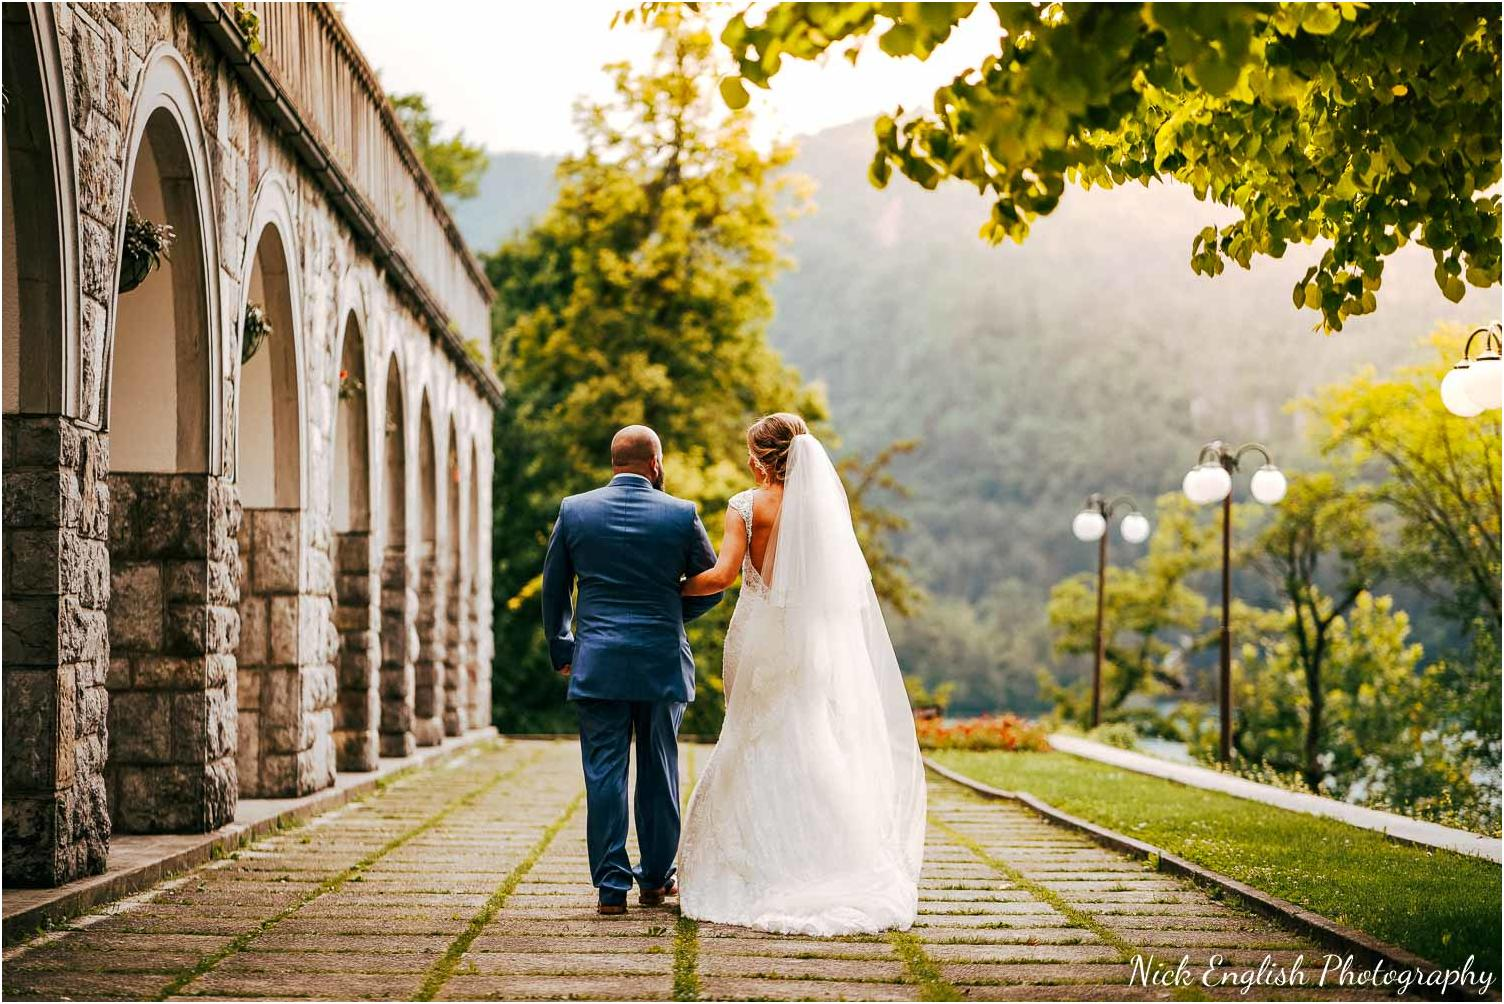 Destination_Wedding_Photographer_Slovenia_Nick_English_Photography-69.jpg